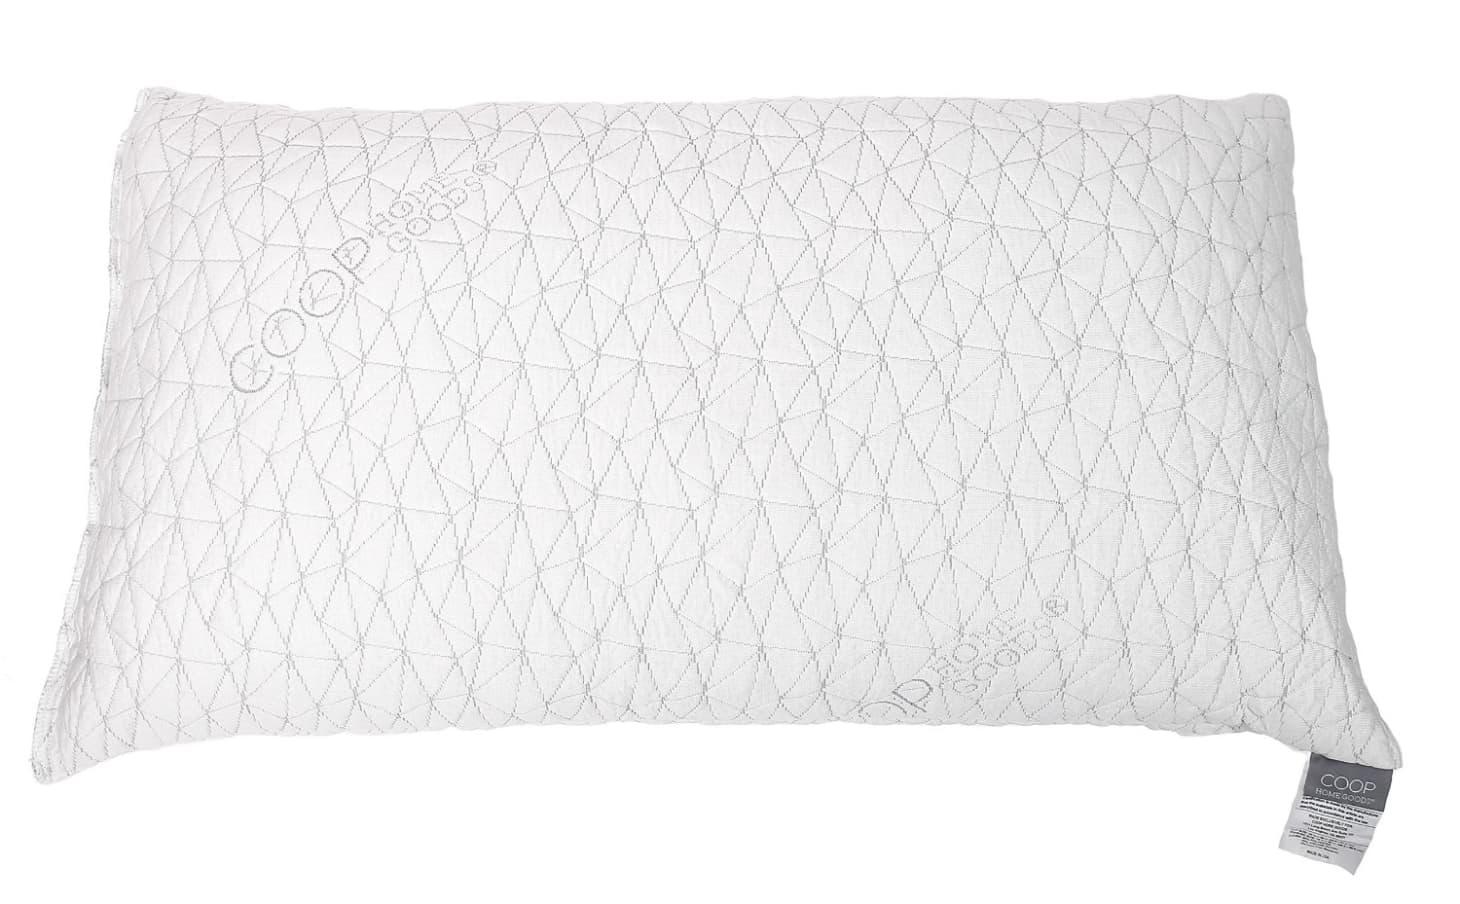 HypoallergenicMade in USA NEW Bamboo Shredded Memory Foam Pillow